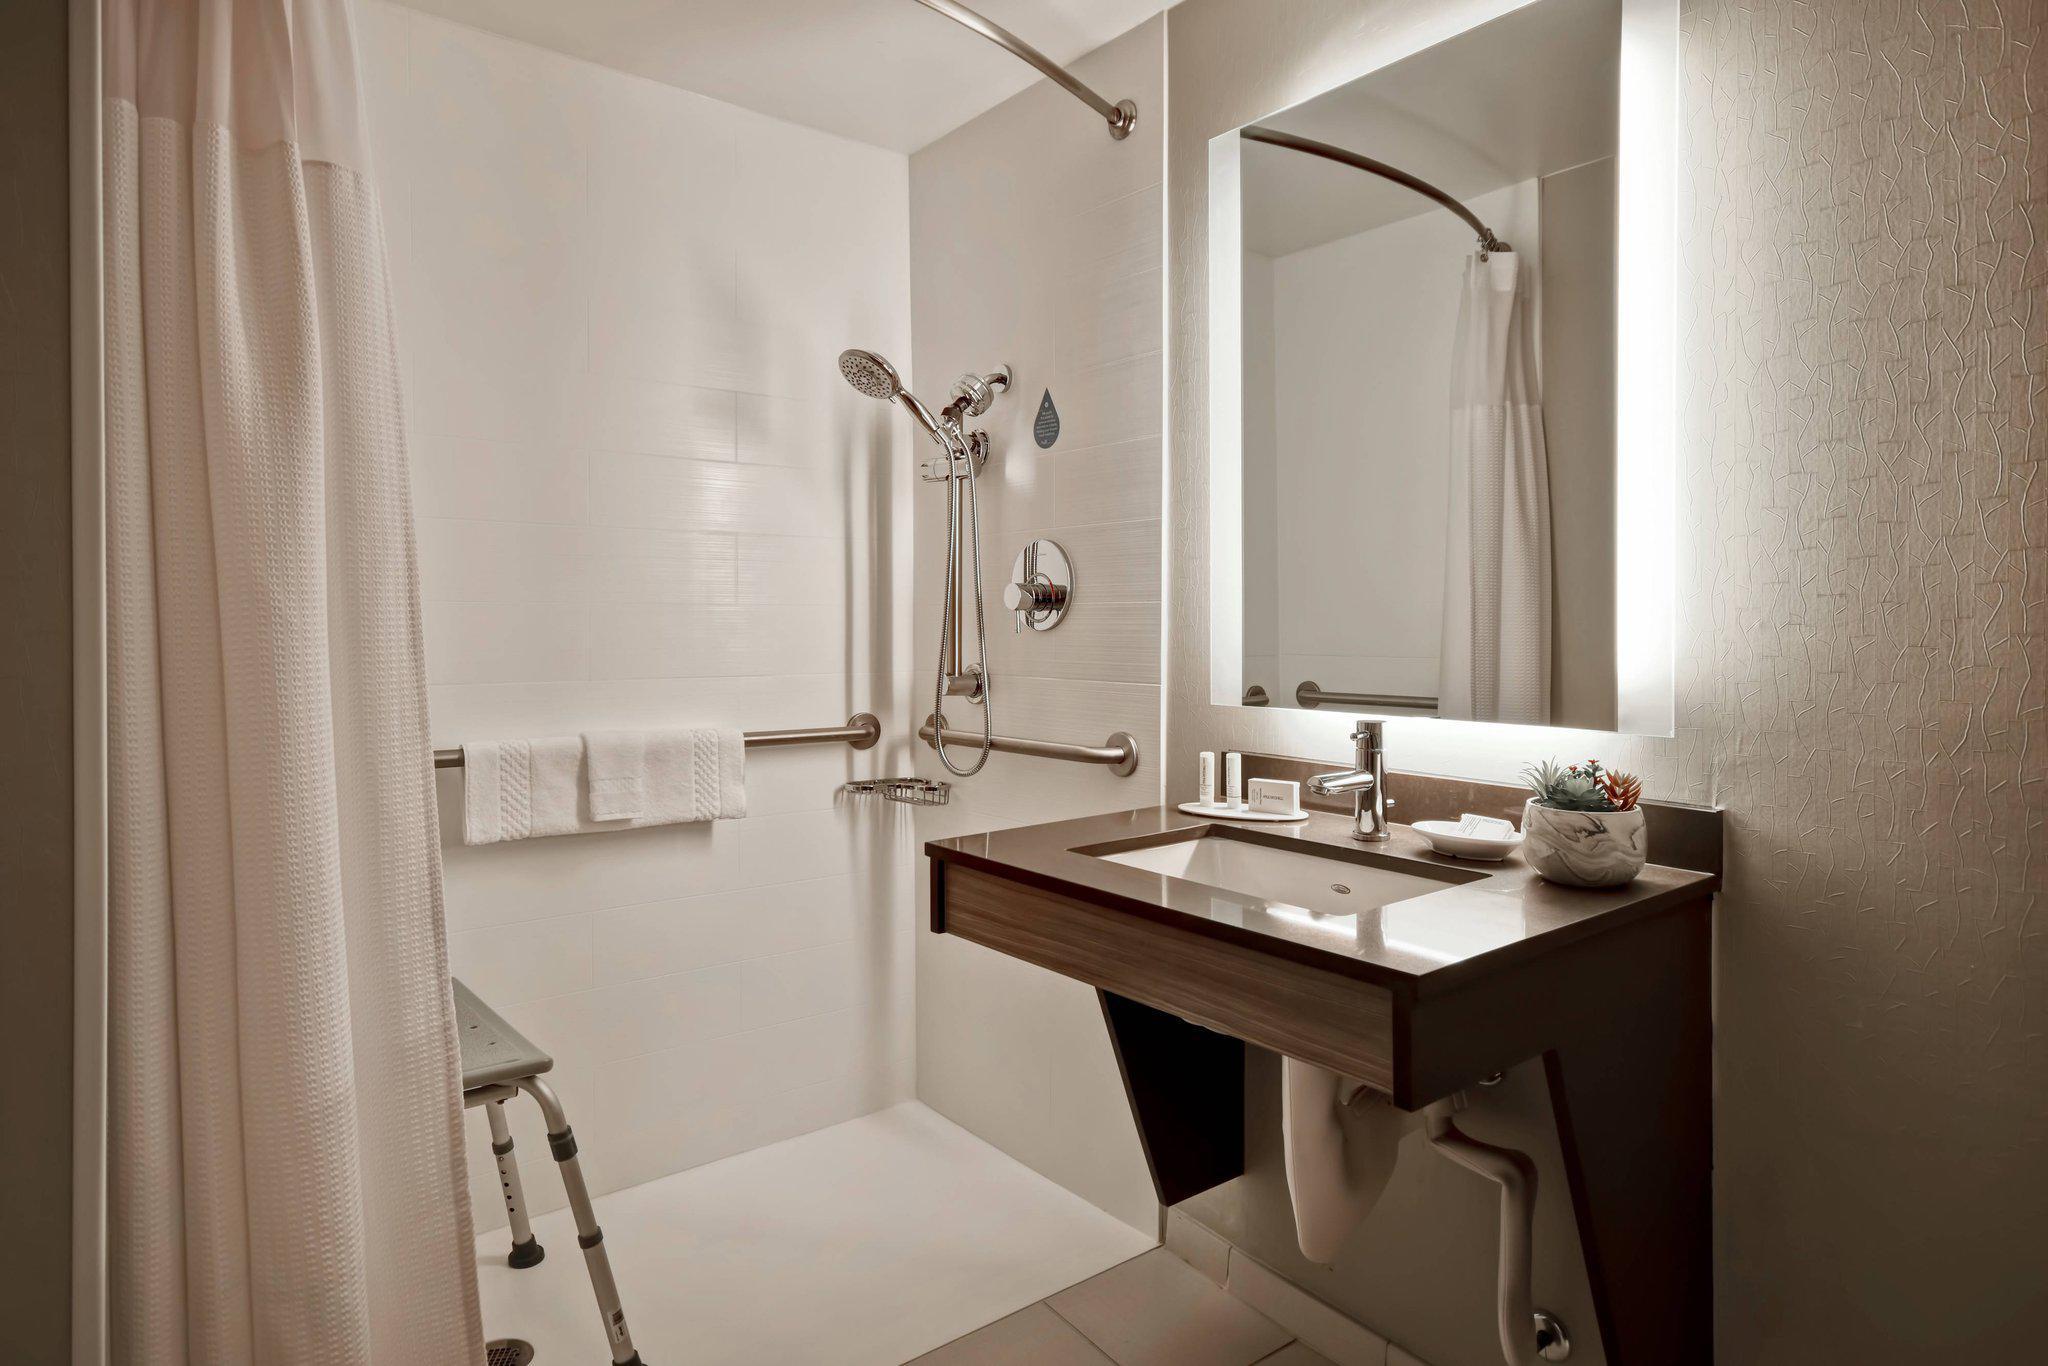 SpringHill Suites by Marriott Atlanta Kennesaw